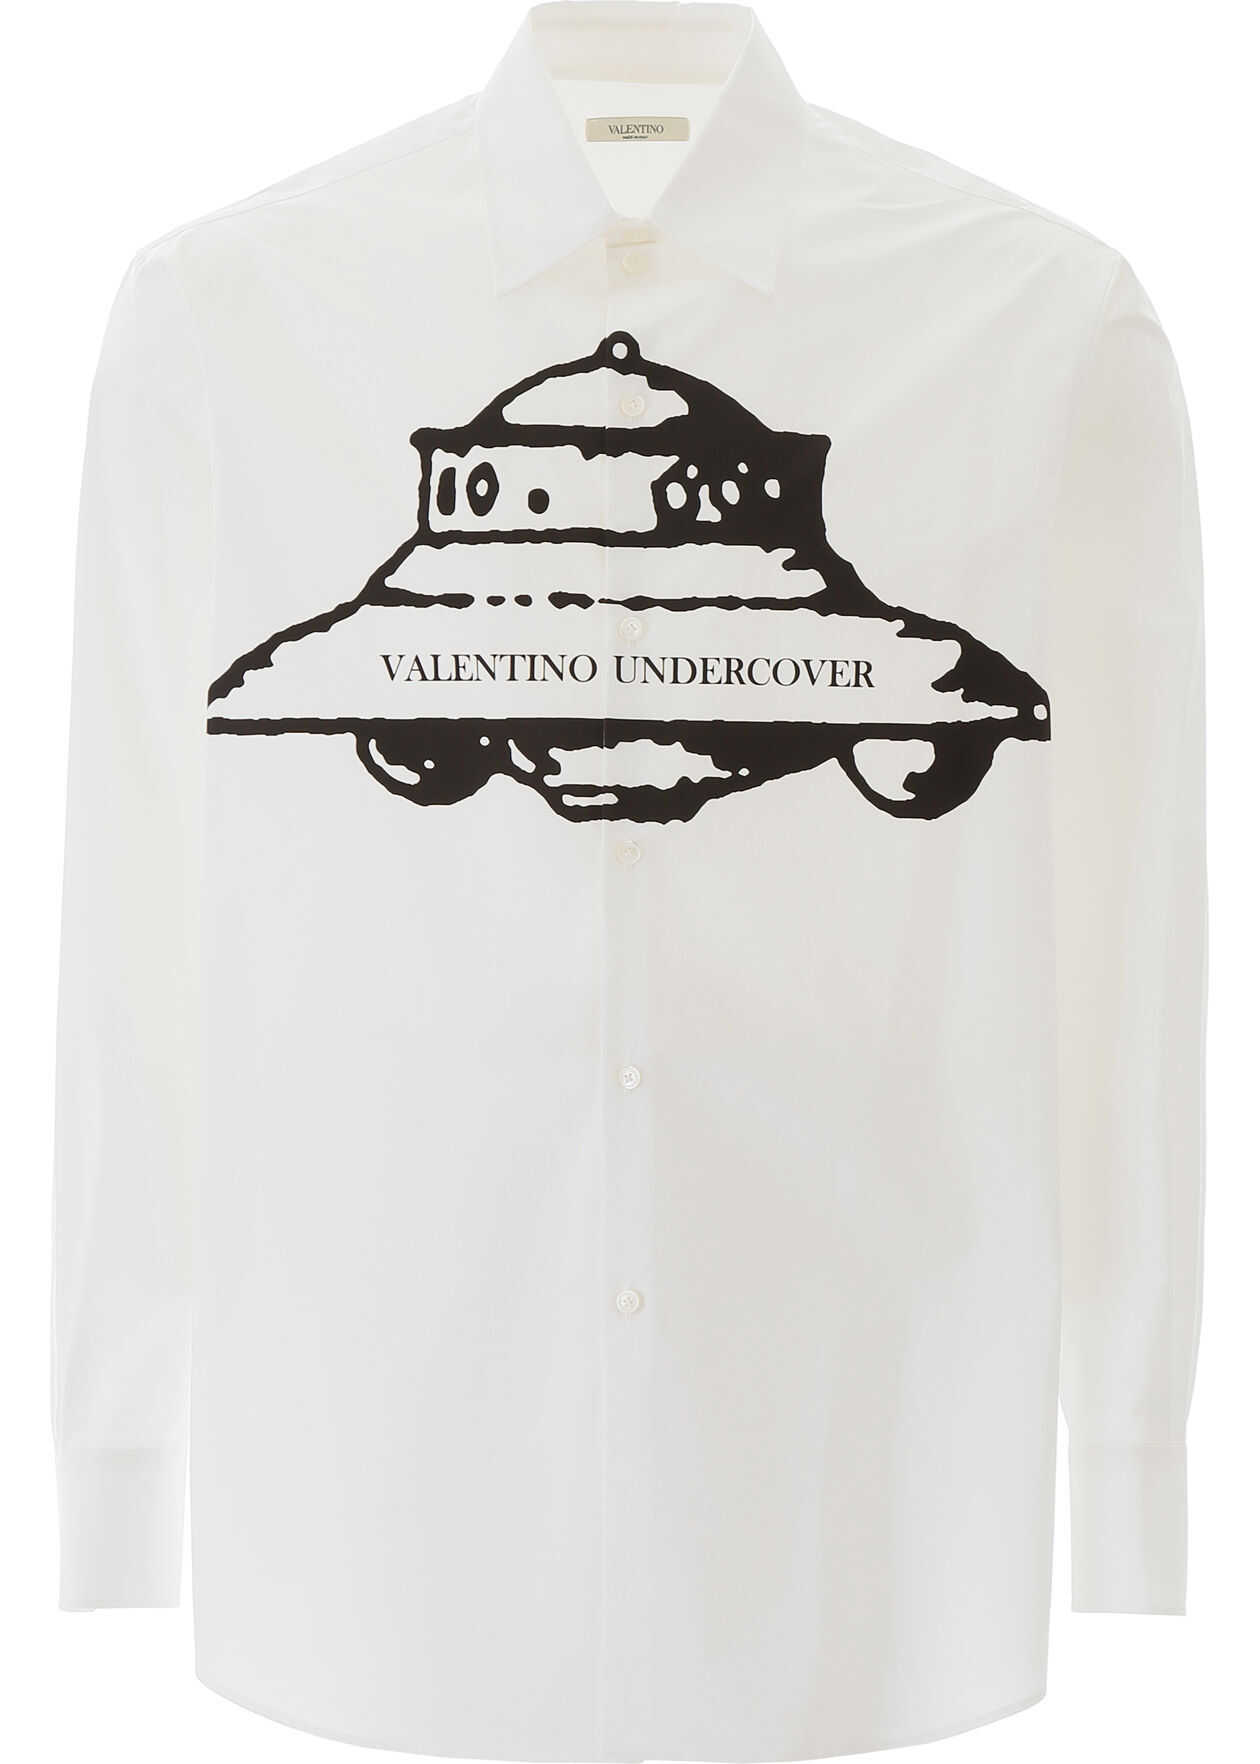 Undercover Shirt thumbnail